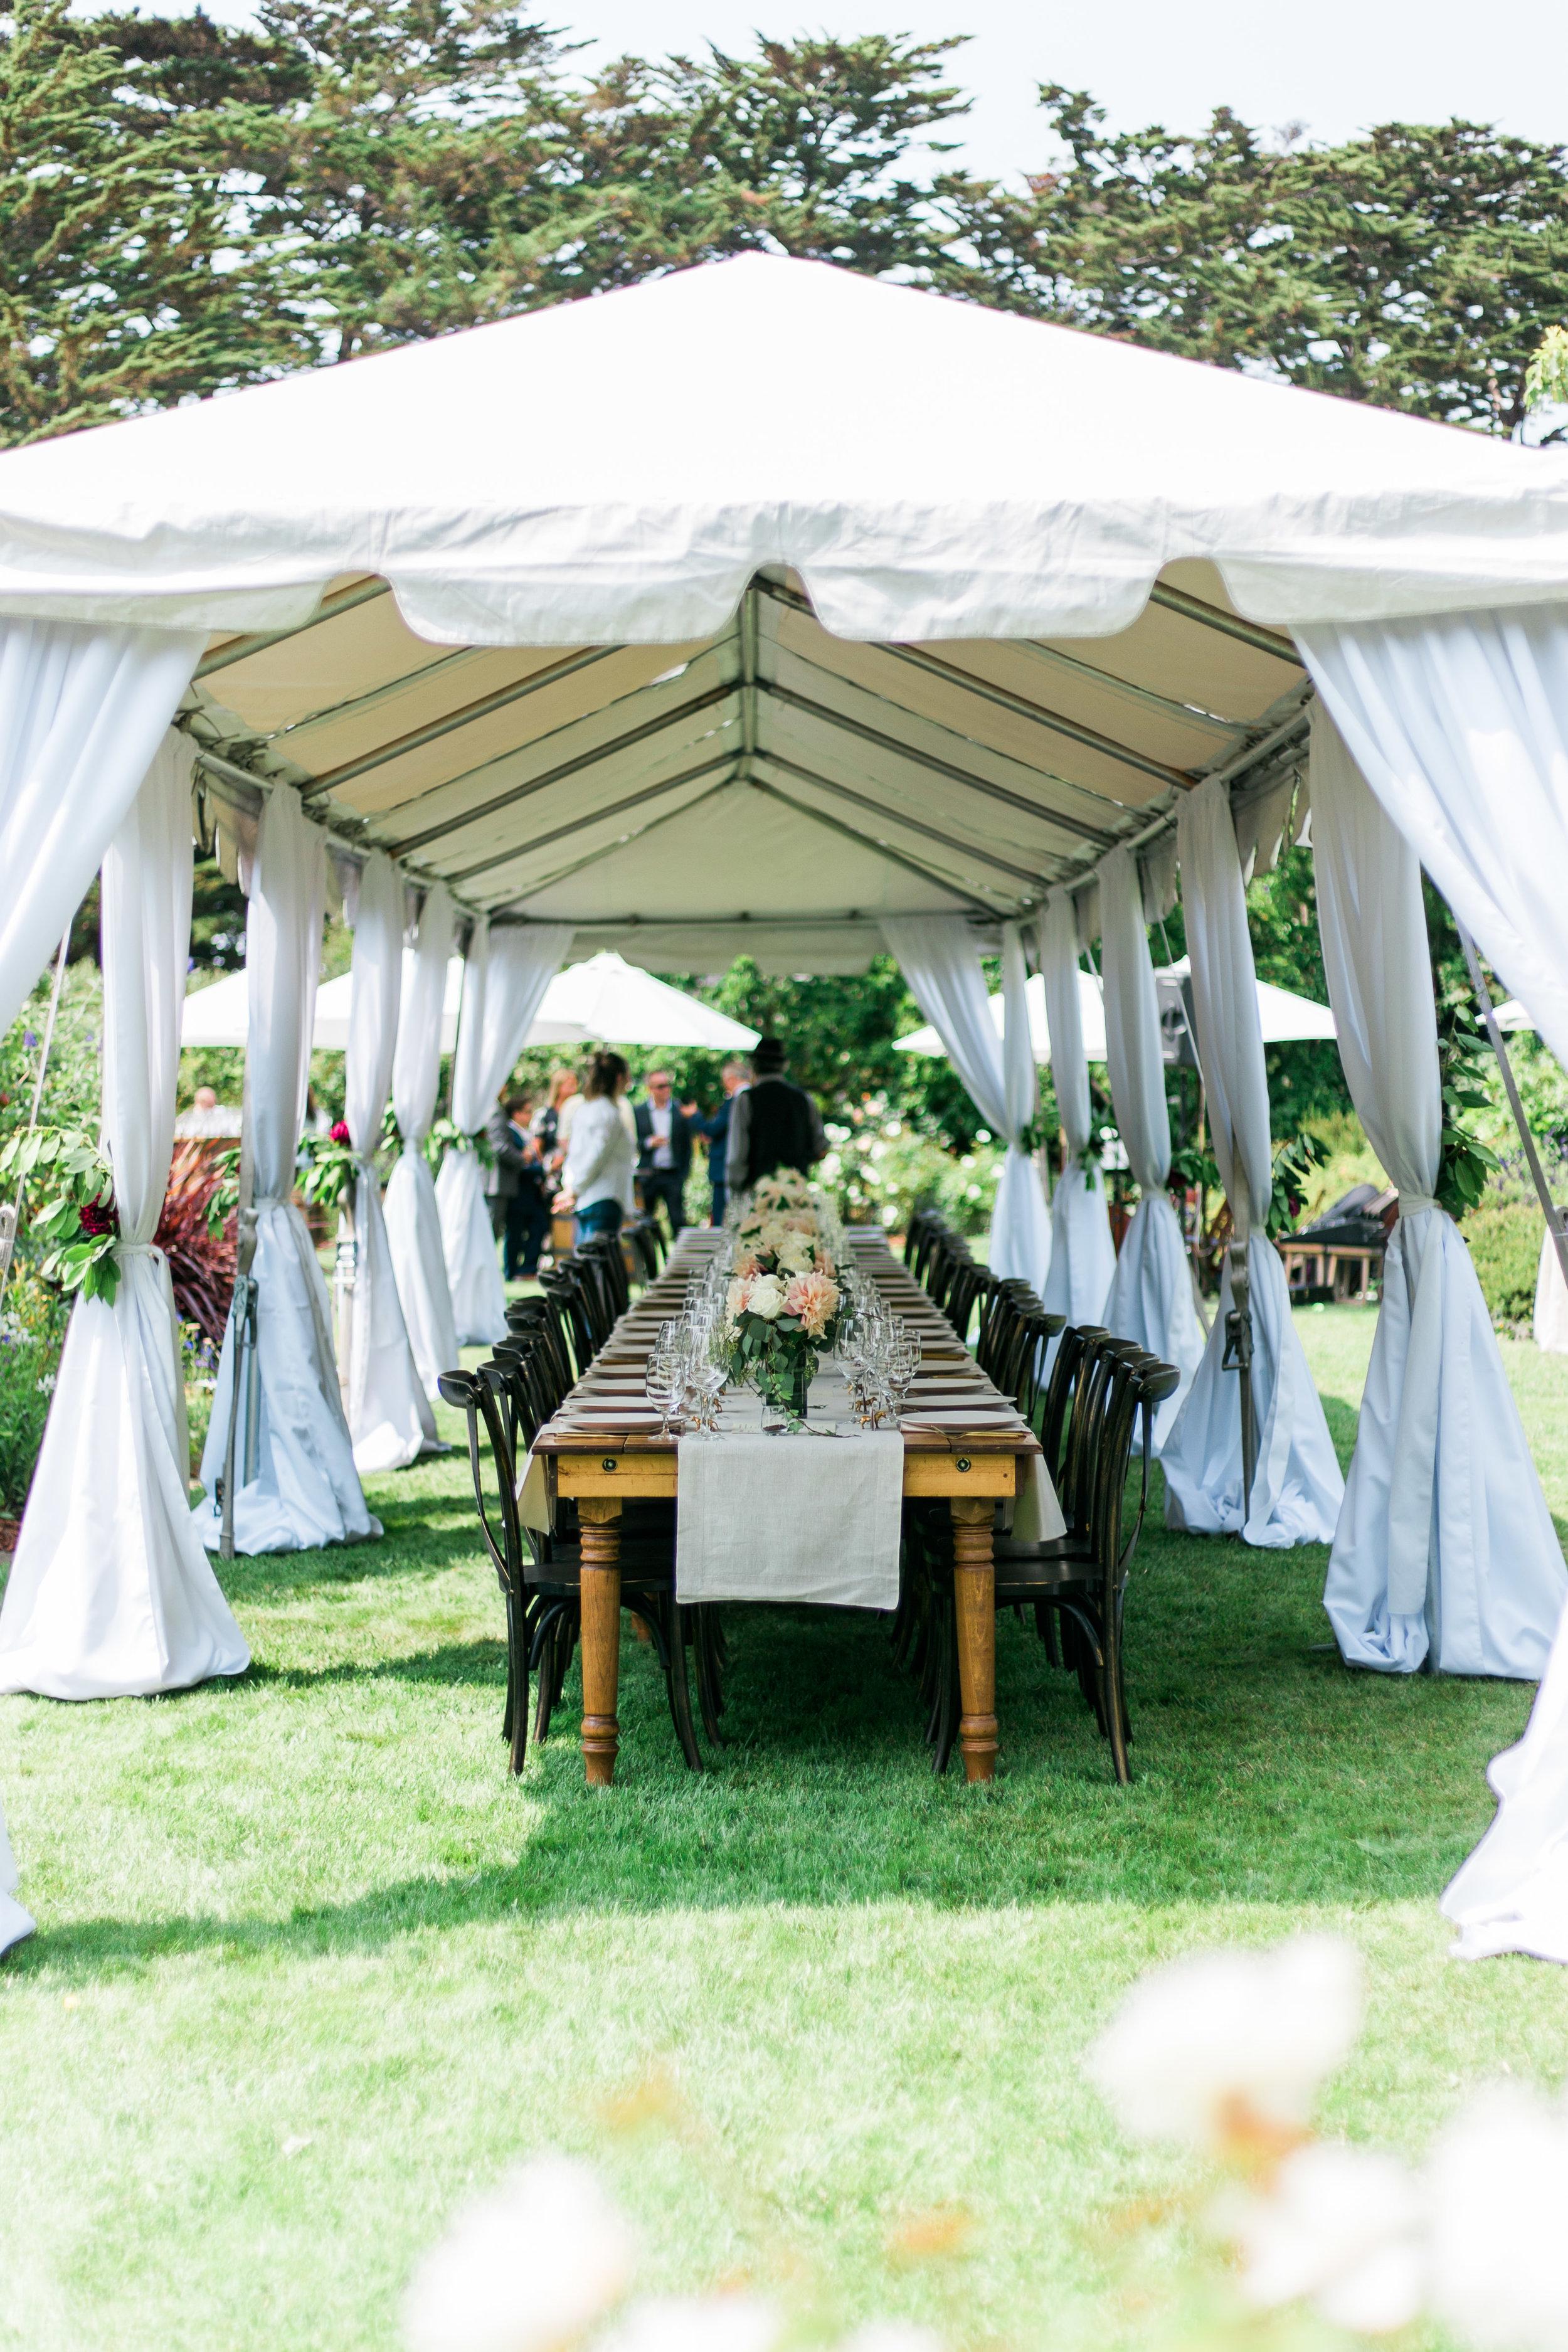 Holly-Nicholas-Wedding-by-JBJ-Pictures-4.jpg